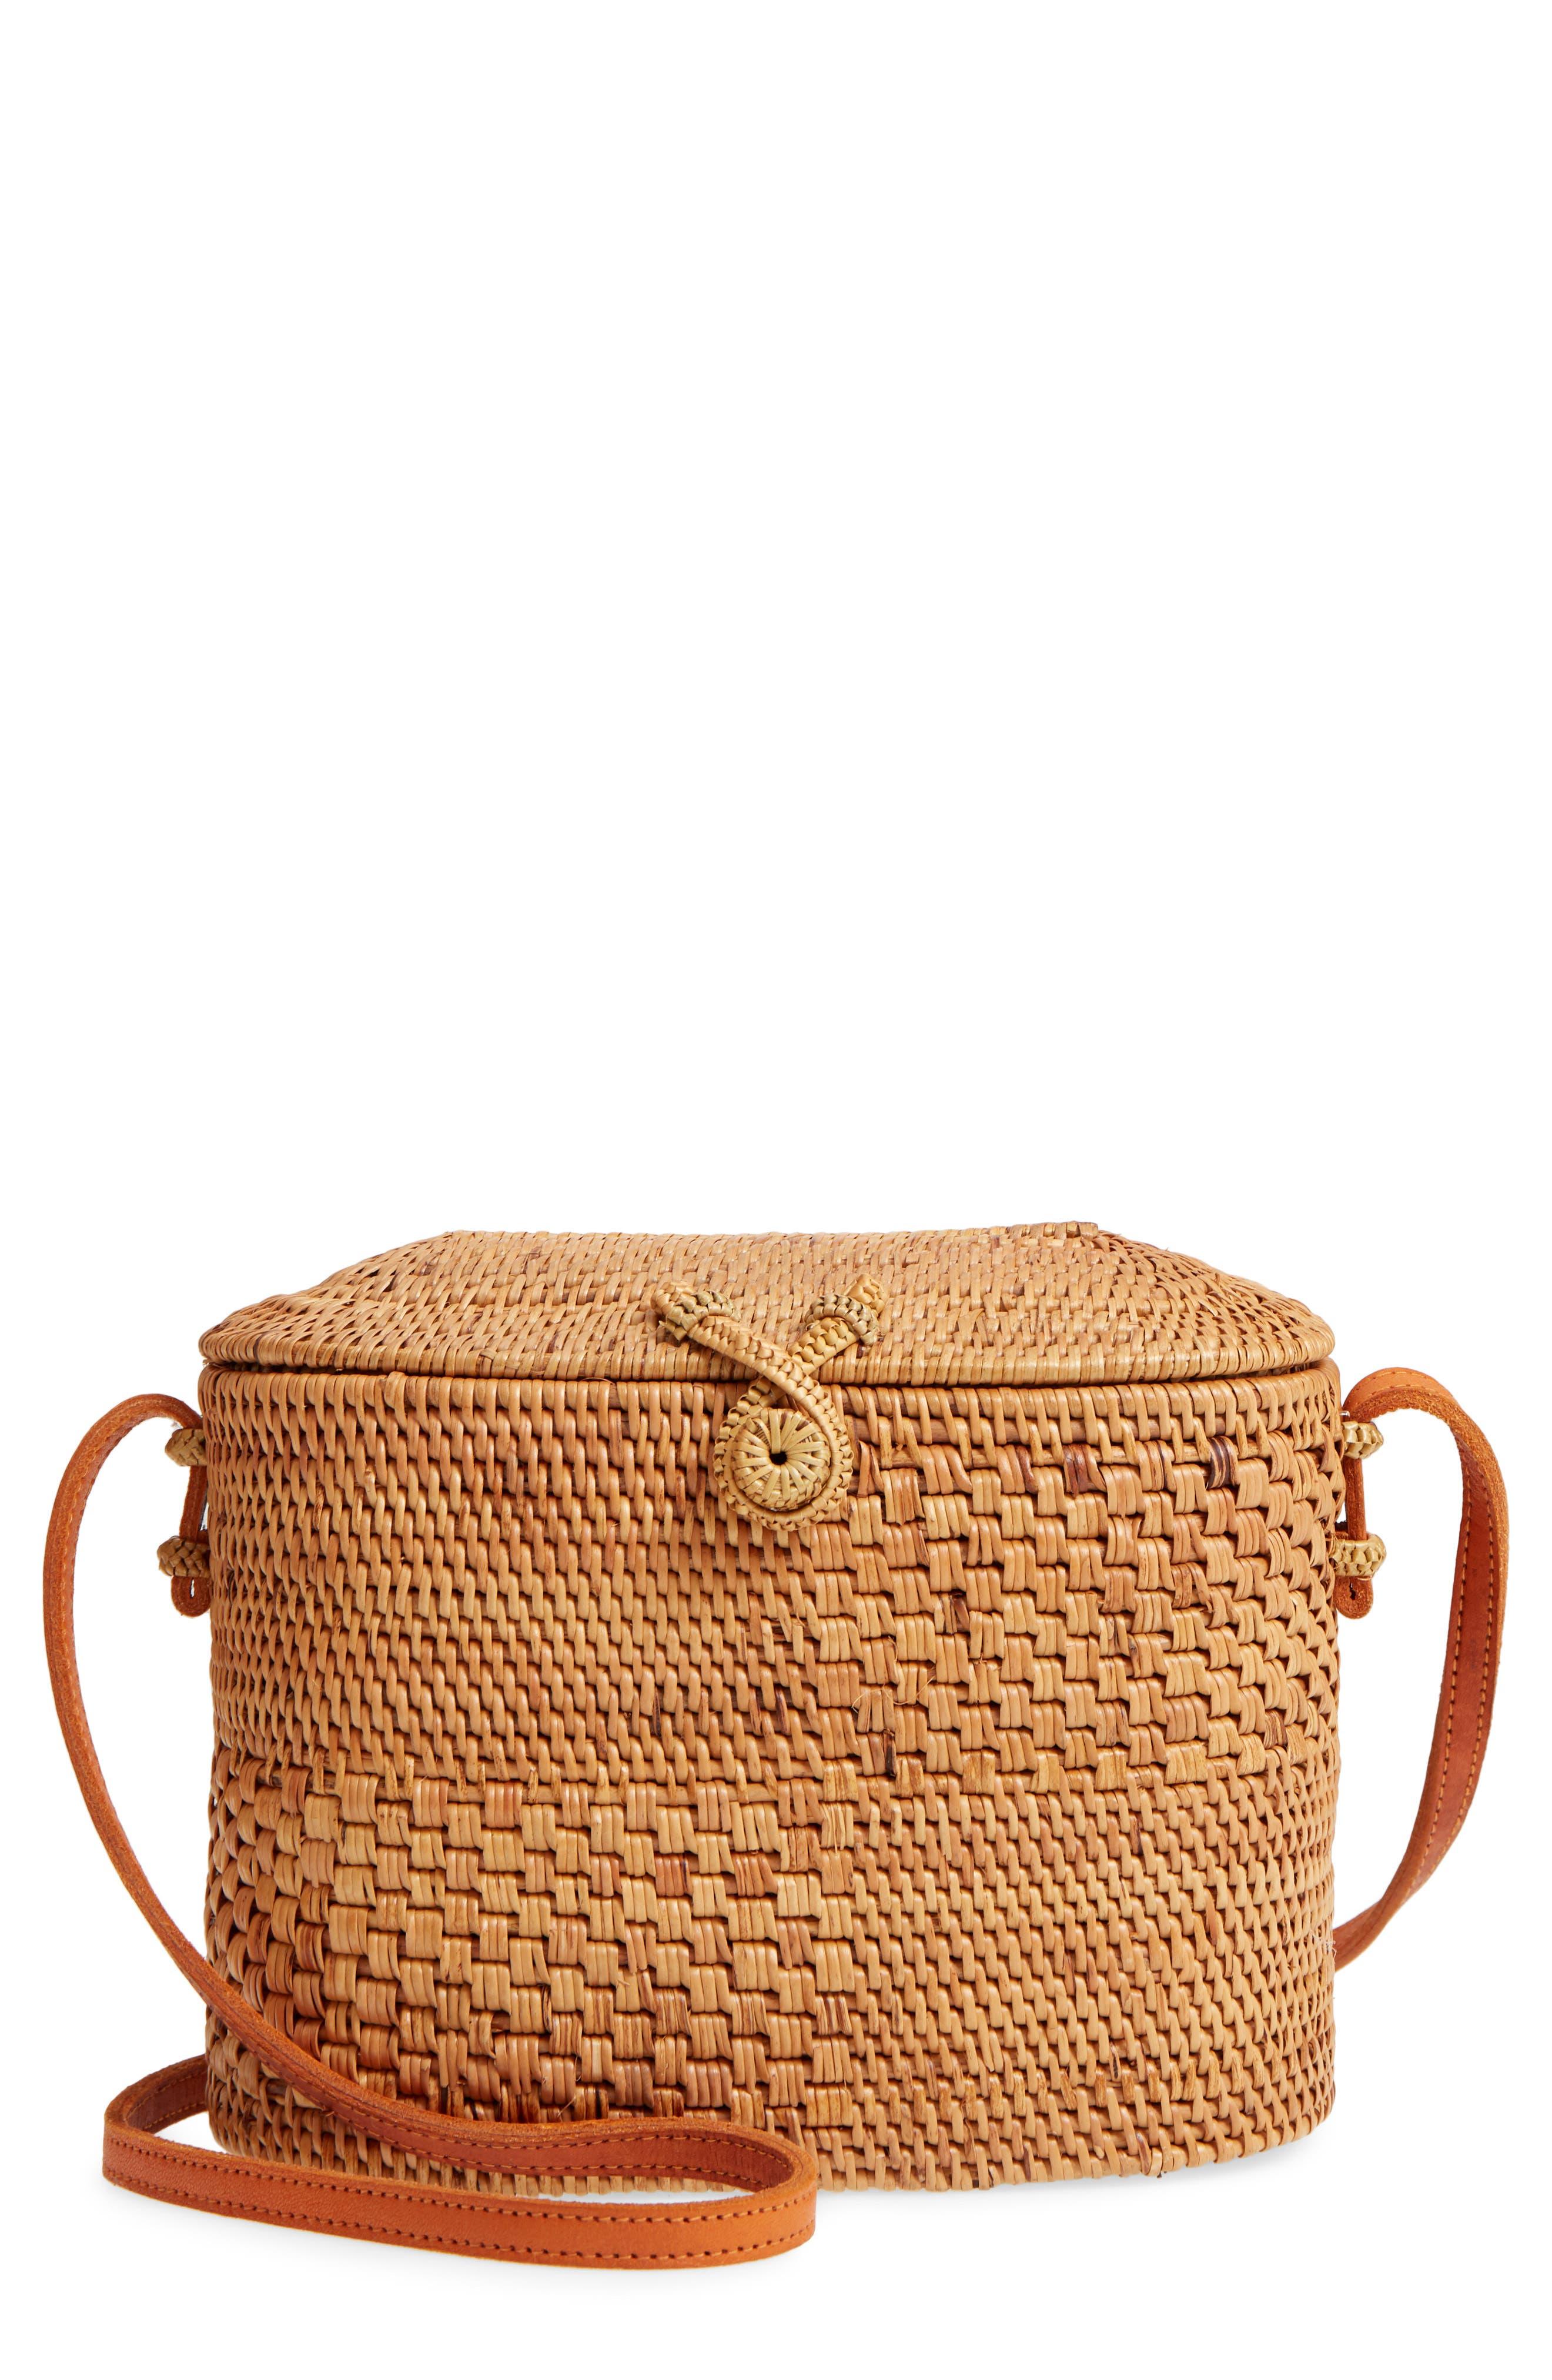 Woven Rattan Box Crossbody Bag,                         Main,                         color, 200